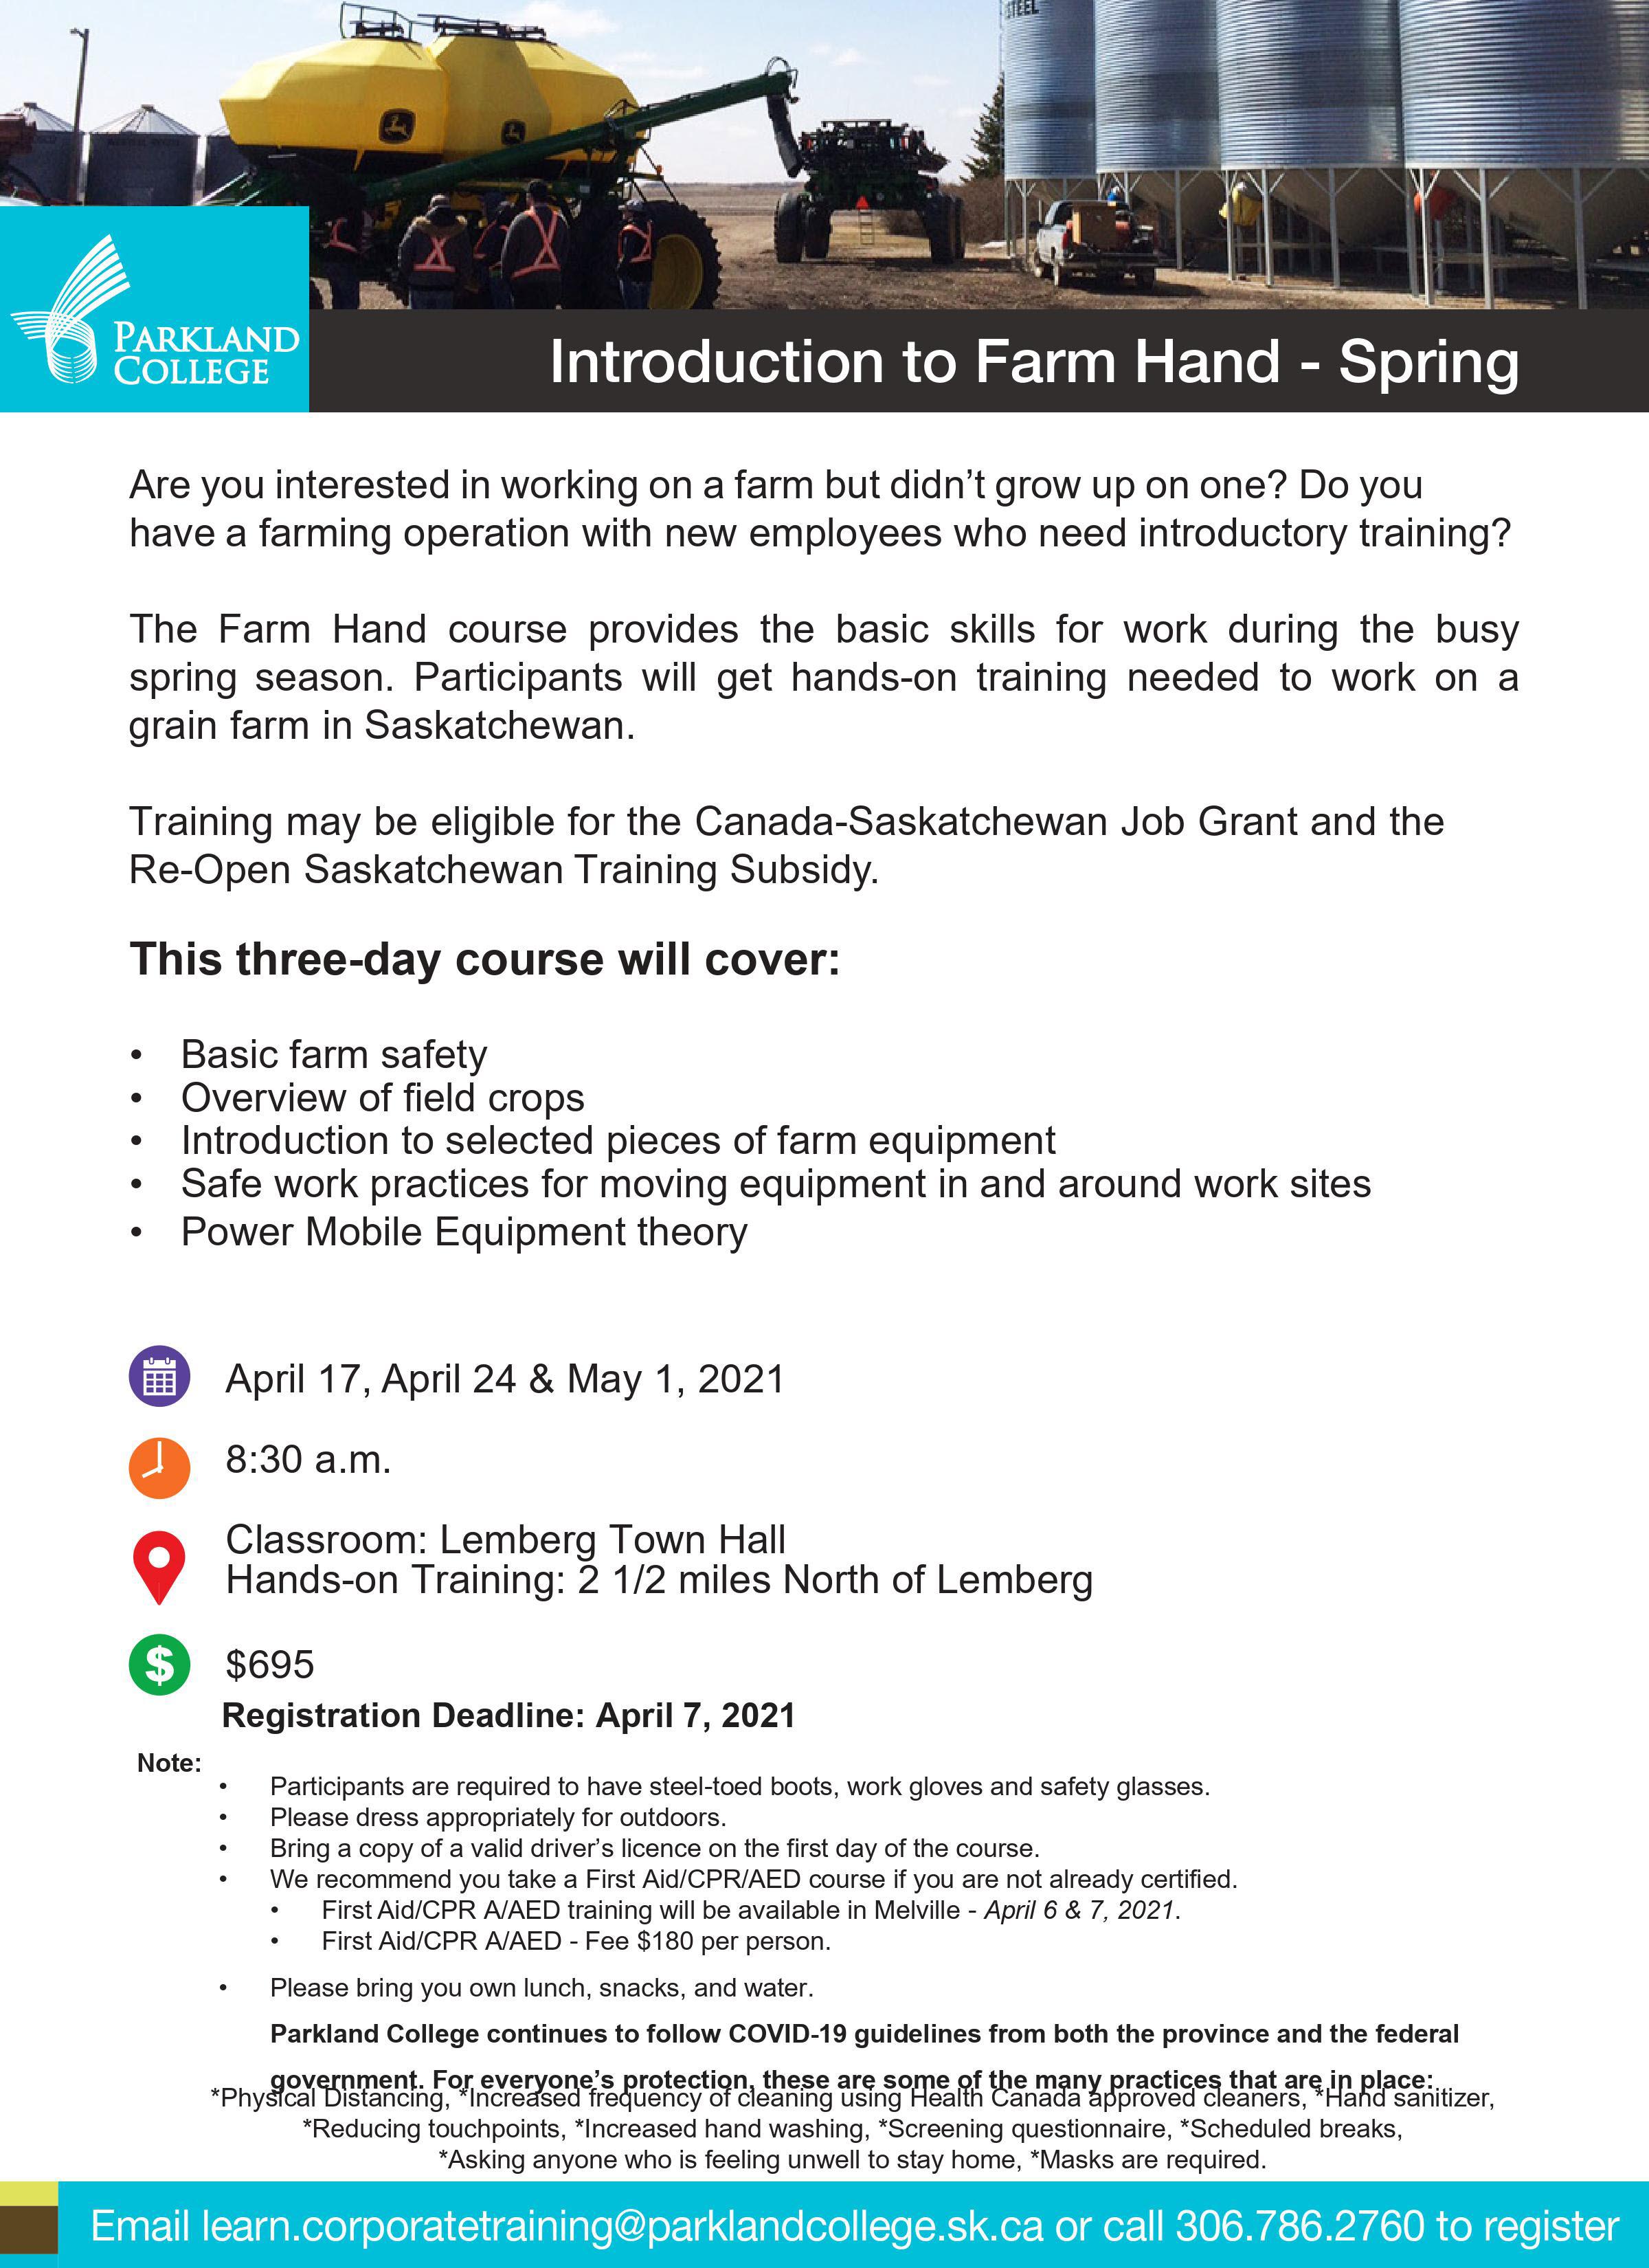 Farm Hand training information